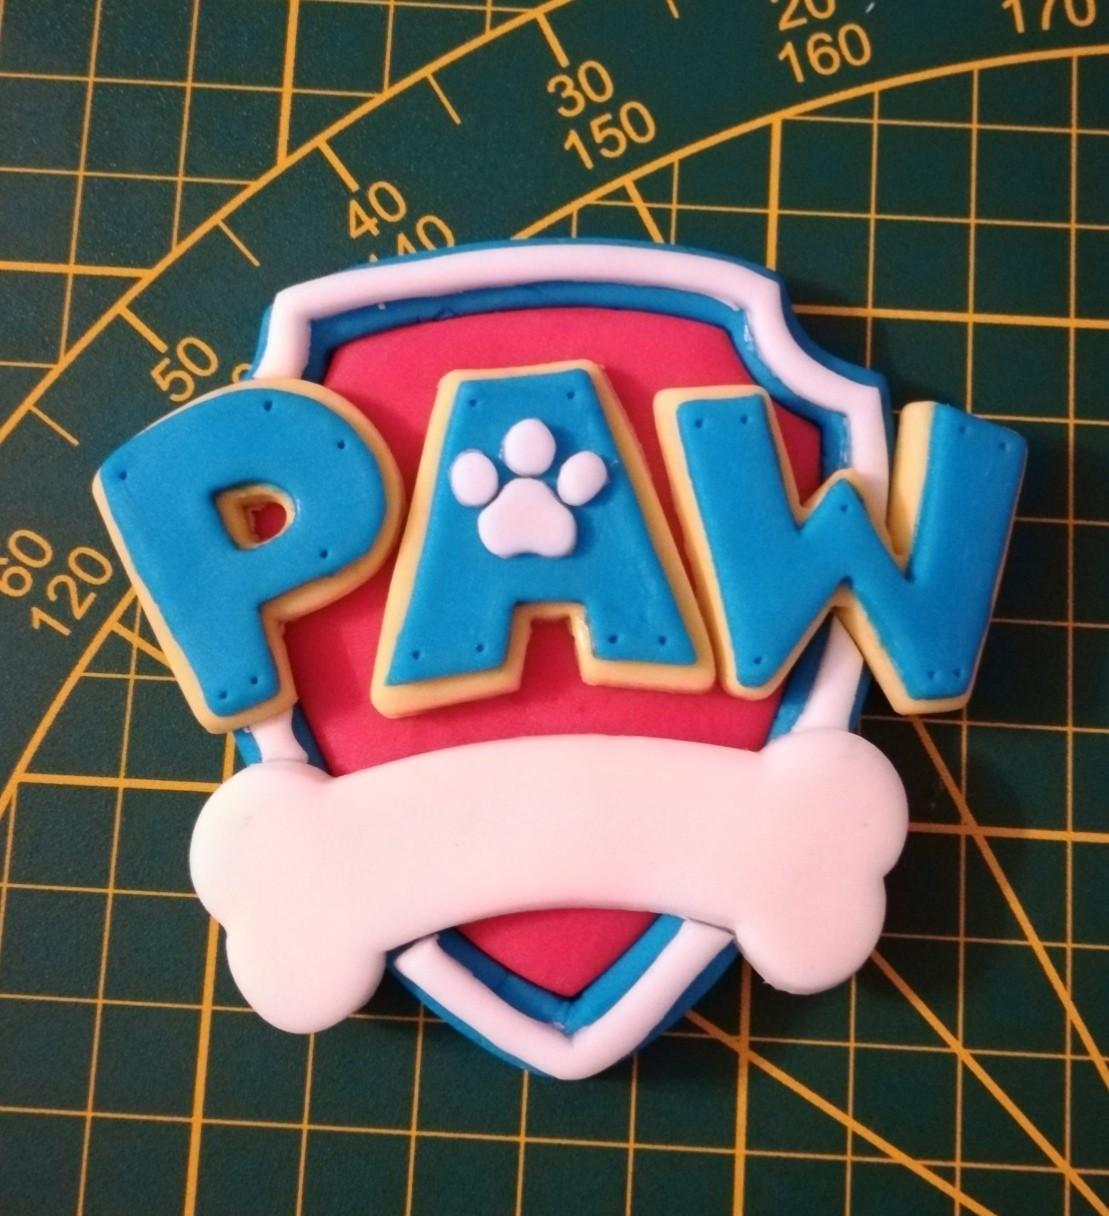 IMG_20180521_002838.jpg Download STL file Patrol Punch (Paw Patrol) • 3D print object, Chris-tropherIlParait